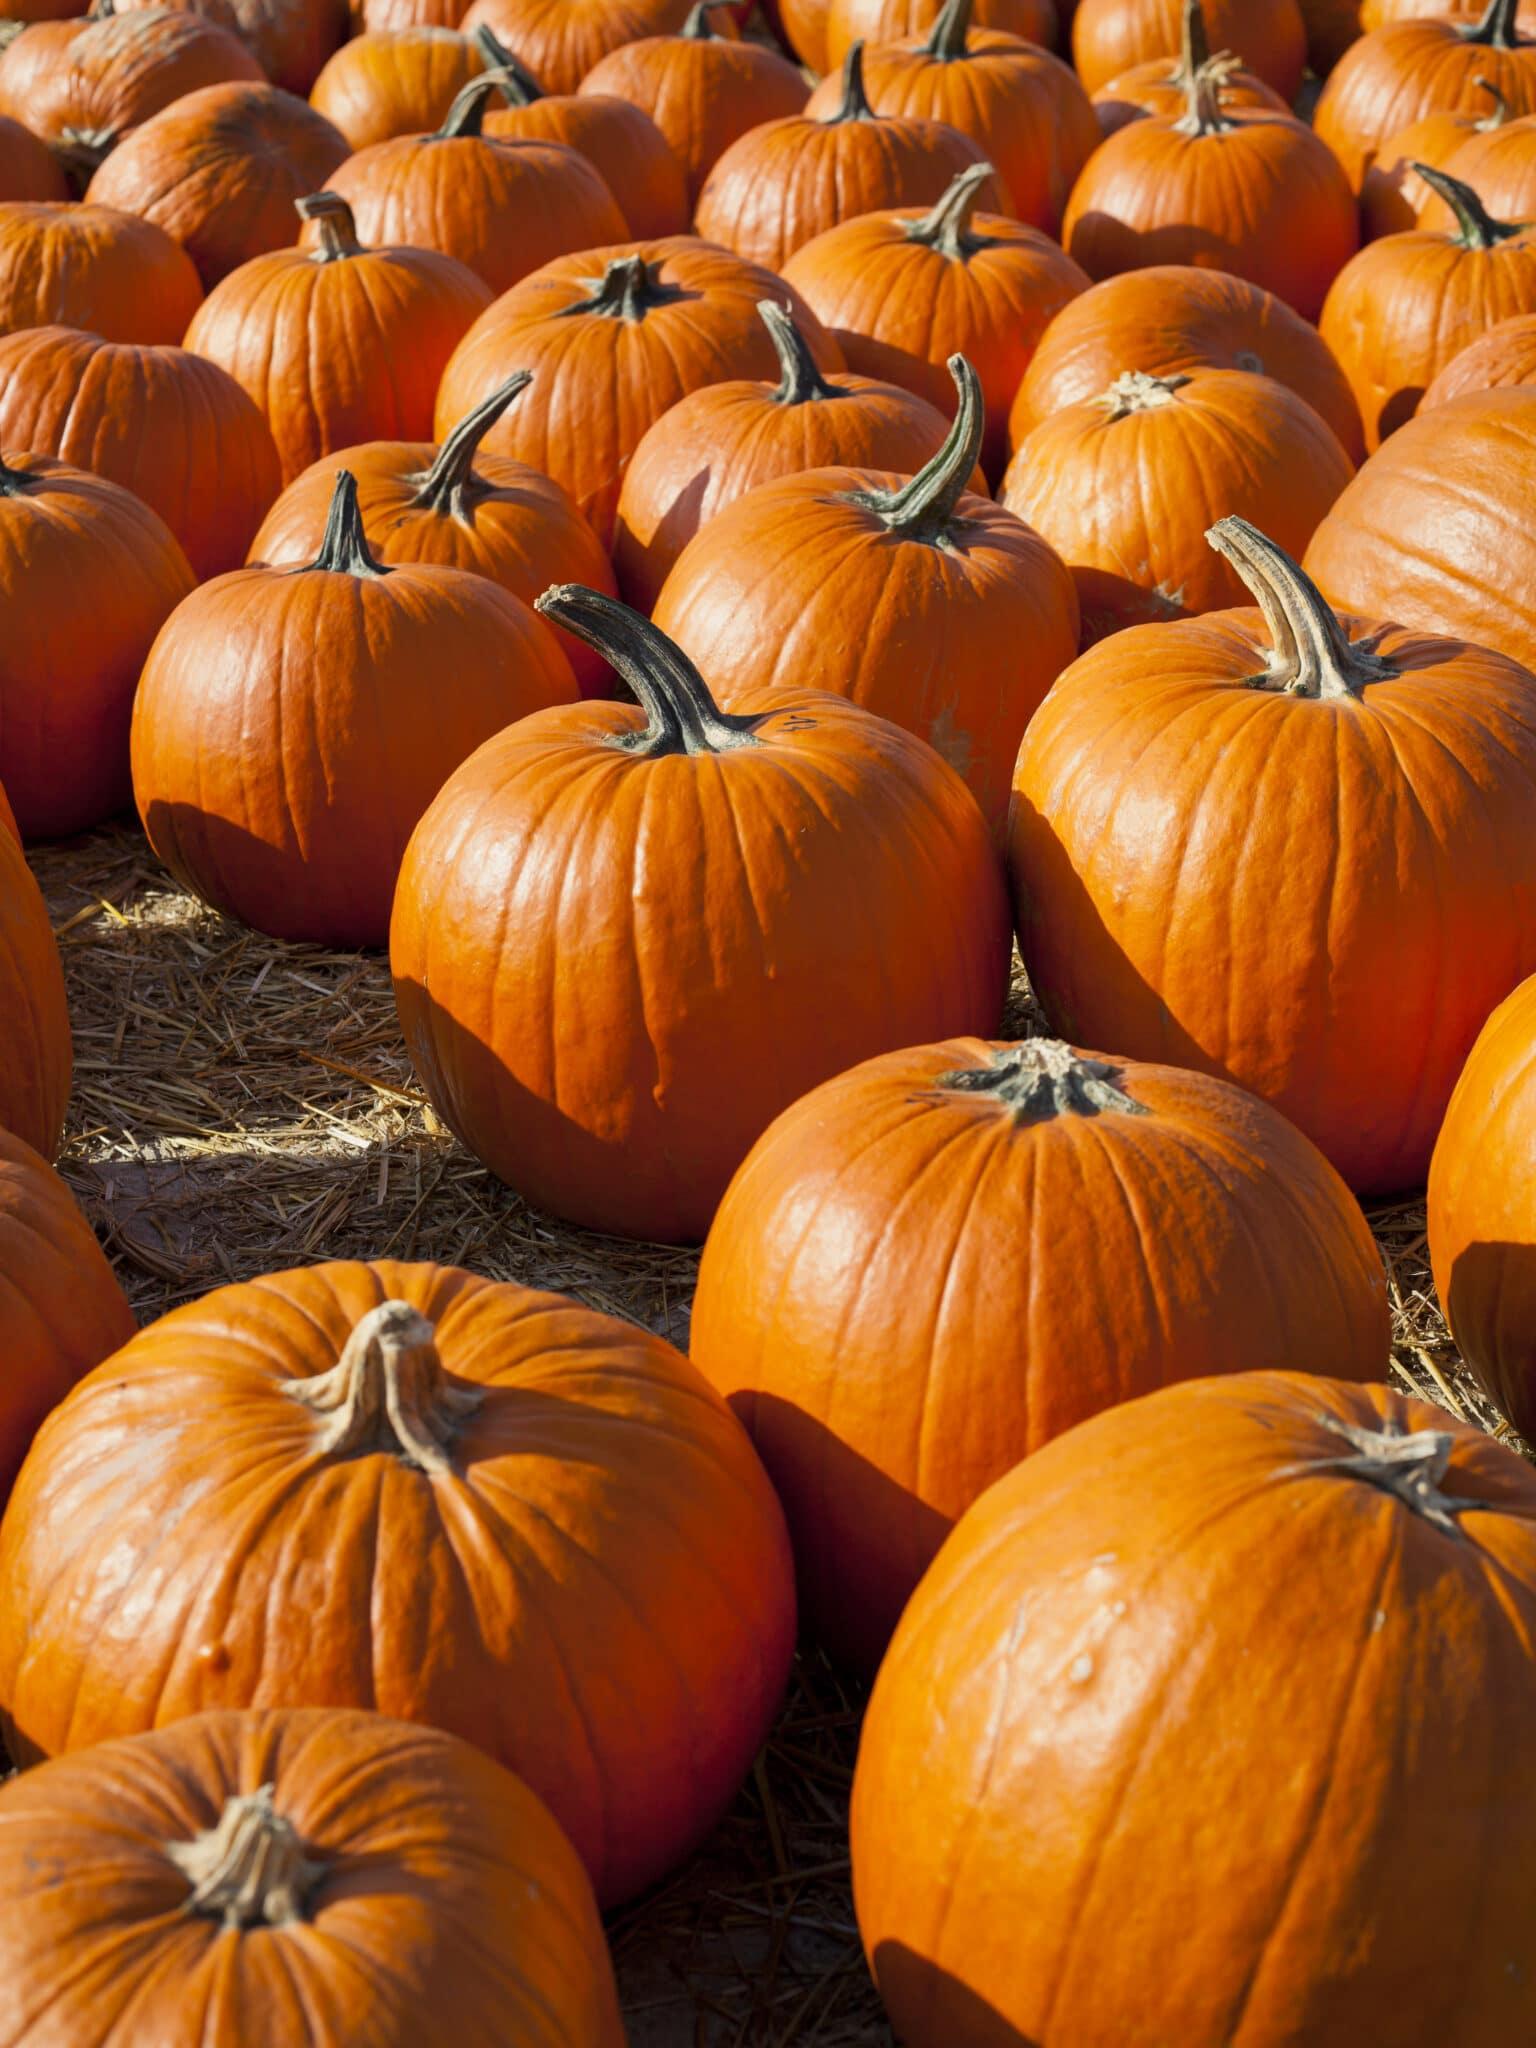 a display of perfectly ripe bright orange pumpkins.